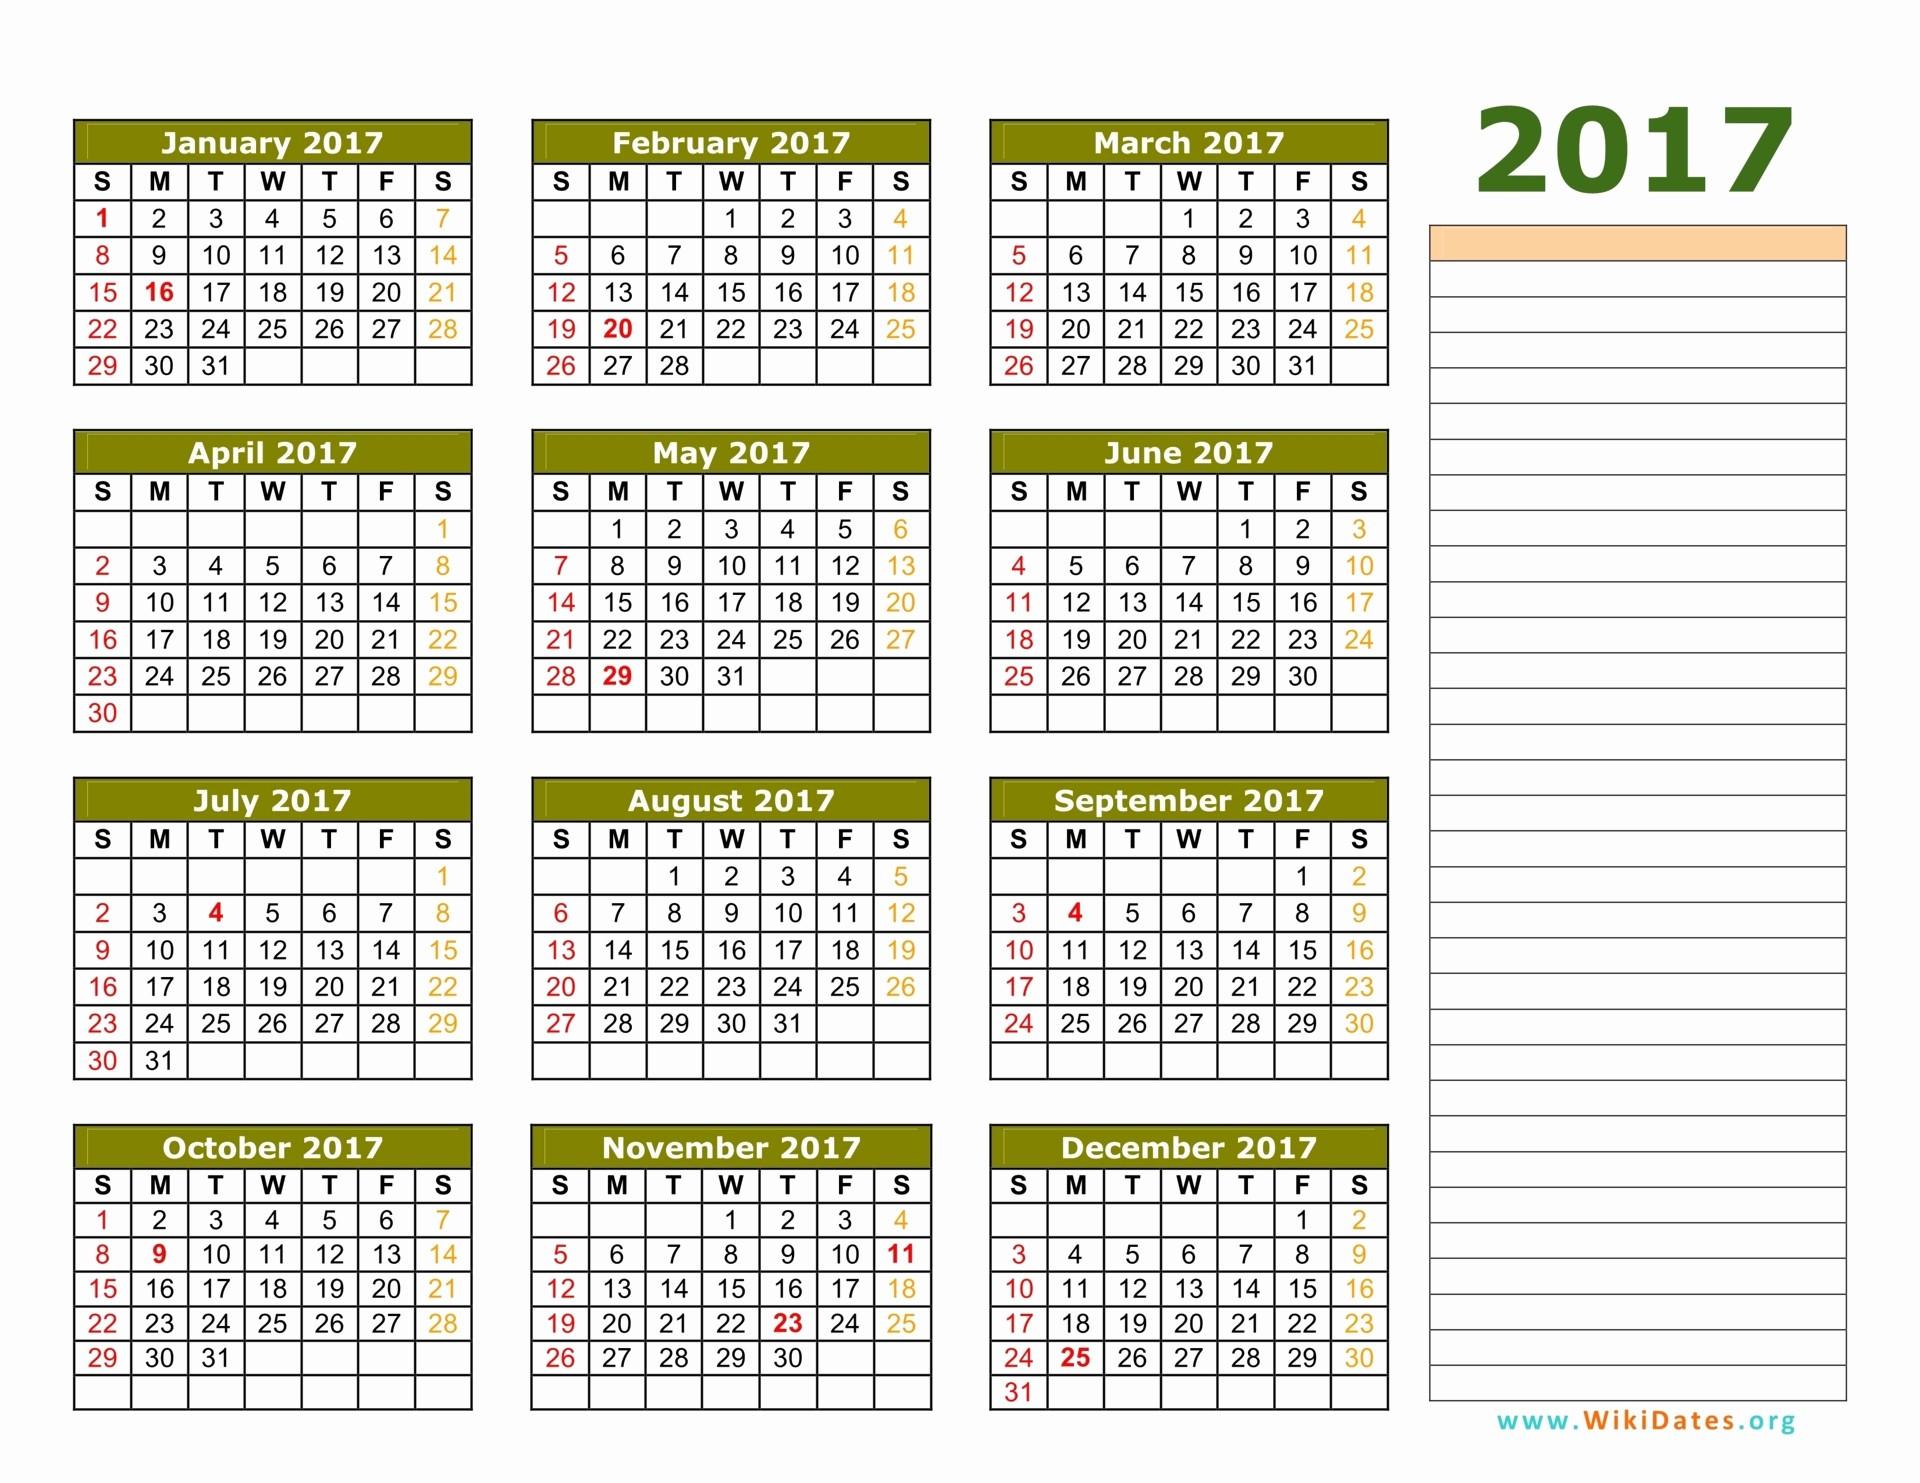 2017 Full Year Calendar Template Awesome 2017 Calendar